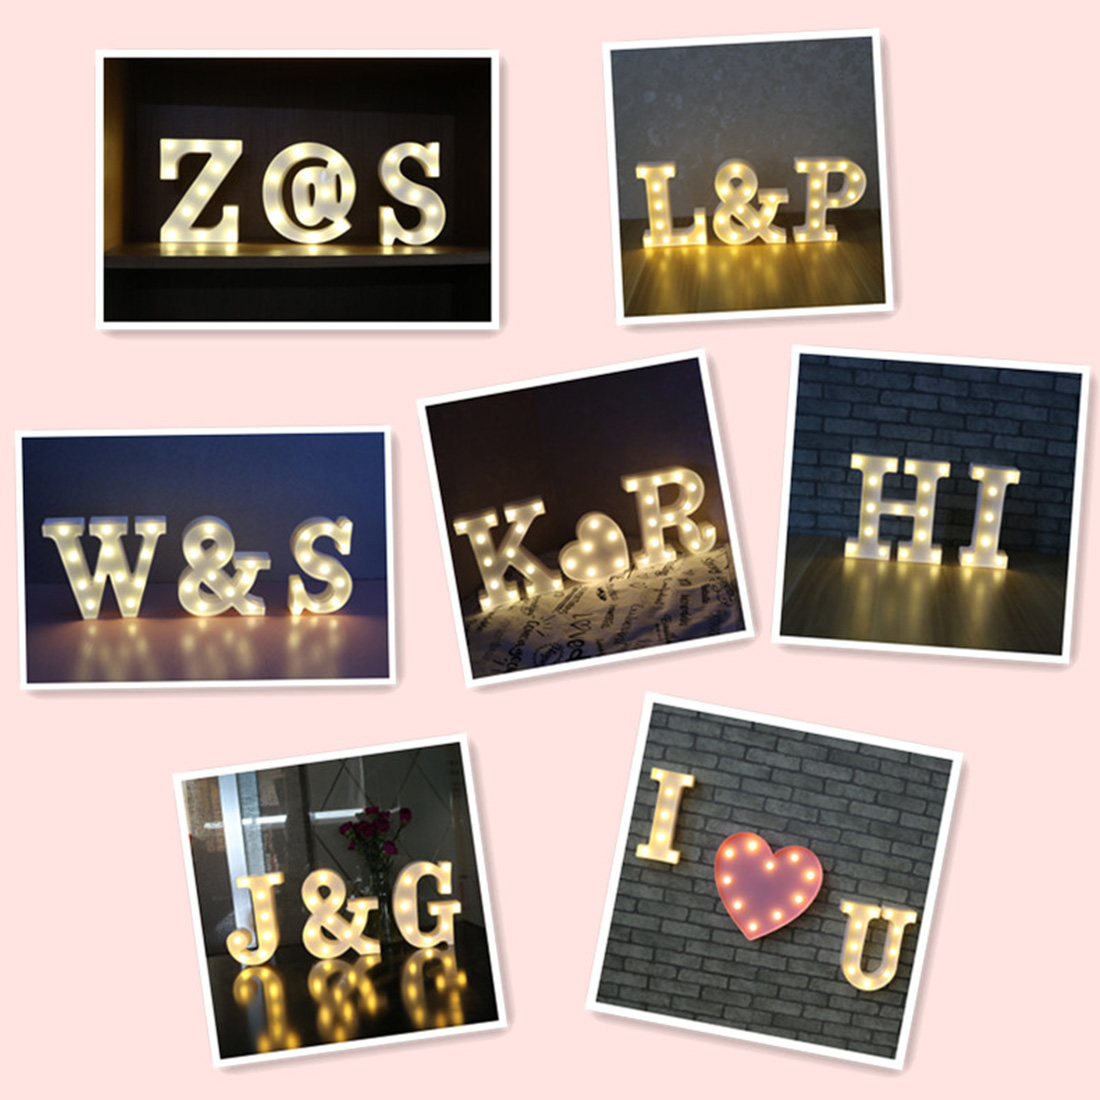 U-Z Light Up Decoration Symbol Indoor Wall Alphabet Letter LED Light White Decoration Wedding Party Window Display Light